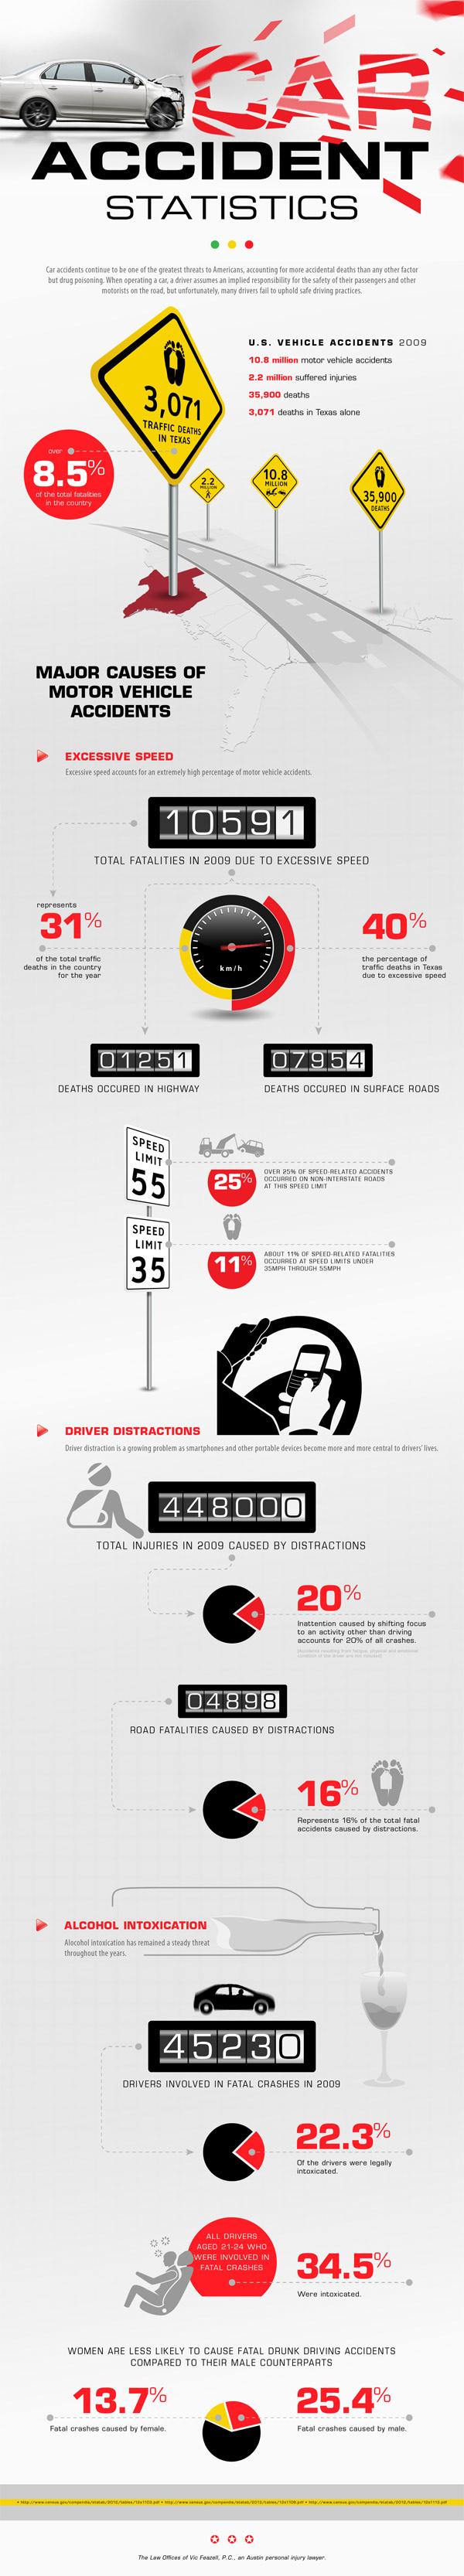 car-accident-statistics-infographic_50b5062a17a15